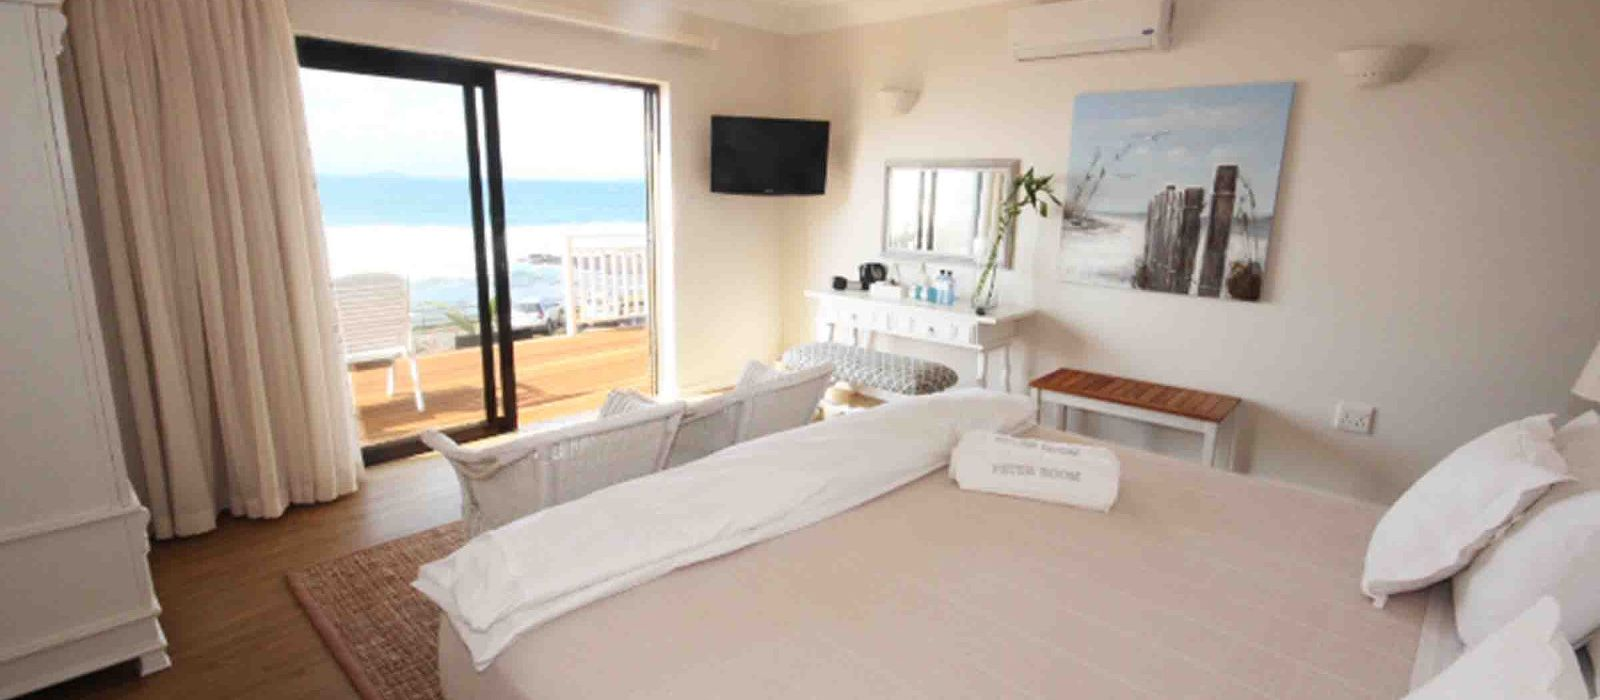 Hotel Fairlight Beach House South Africa